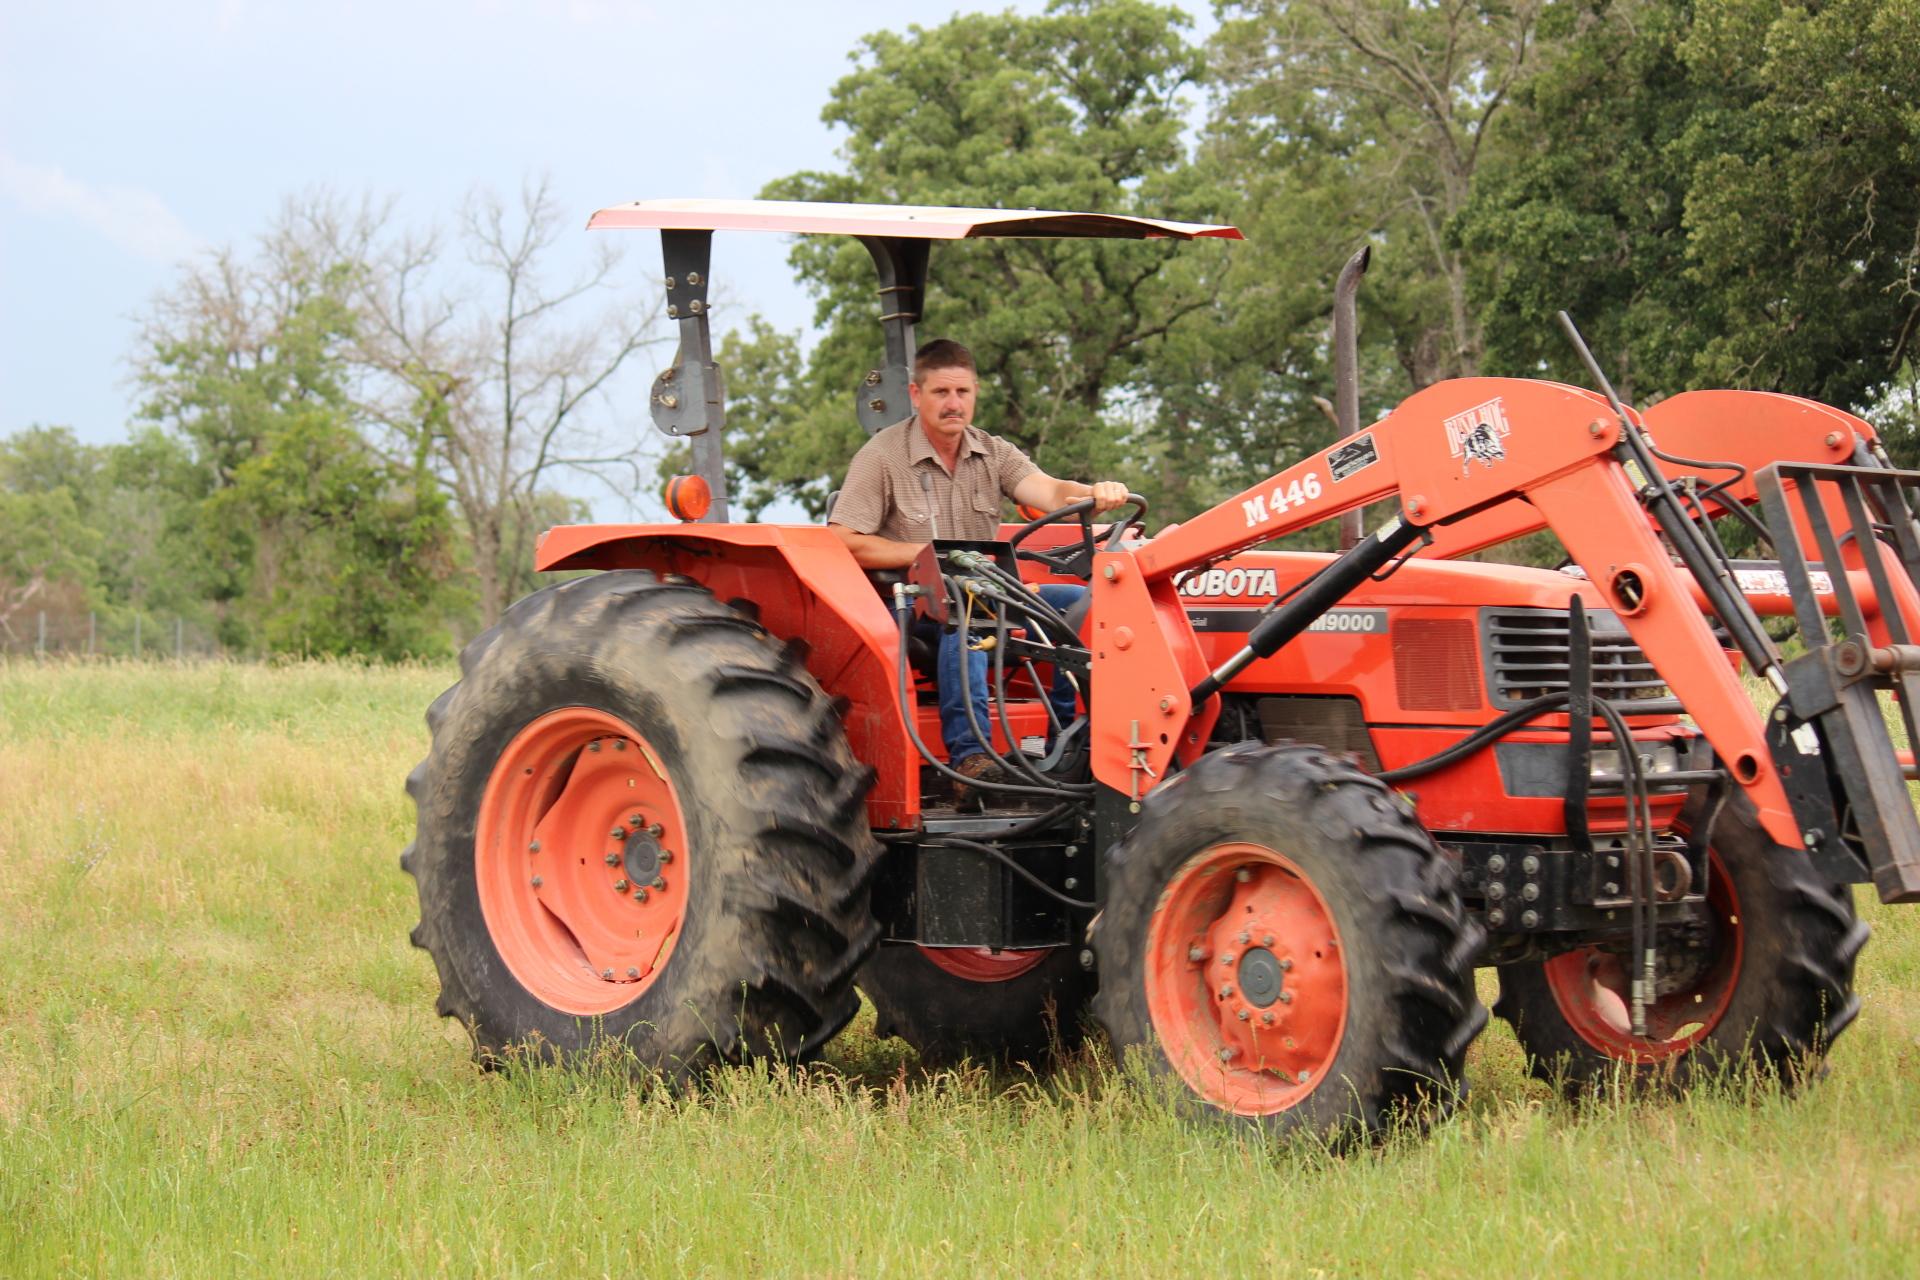 Mike Baird, Quality Custom Fence, Custom Fence Houston, Custom Fence Texas, Triple B Game Ranch, B&B Taxidermy, Texas Ranch, Texas Ranch Fence, Texas Ranch Construction, Texas Gates, Fence Building, Texas Fences Building